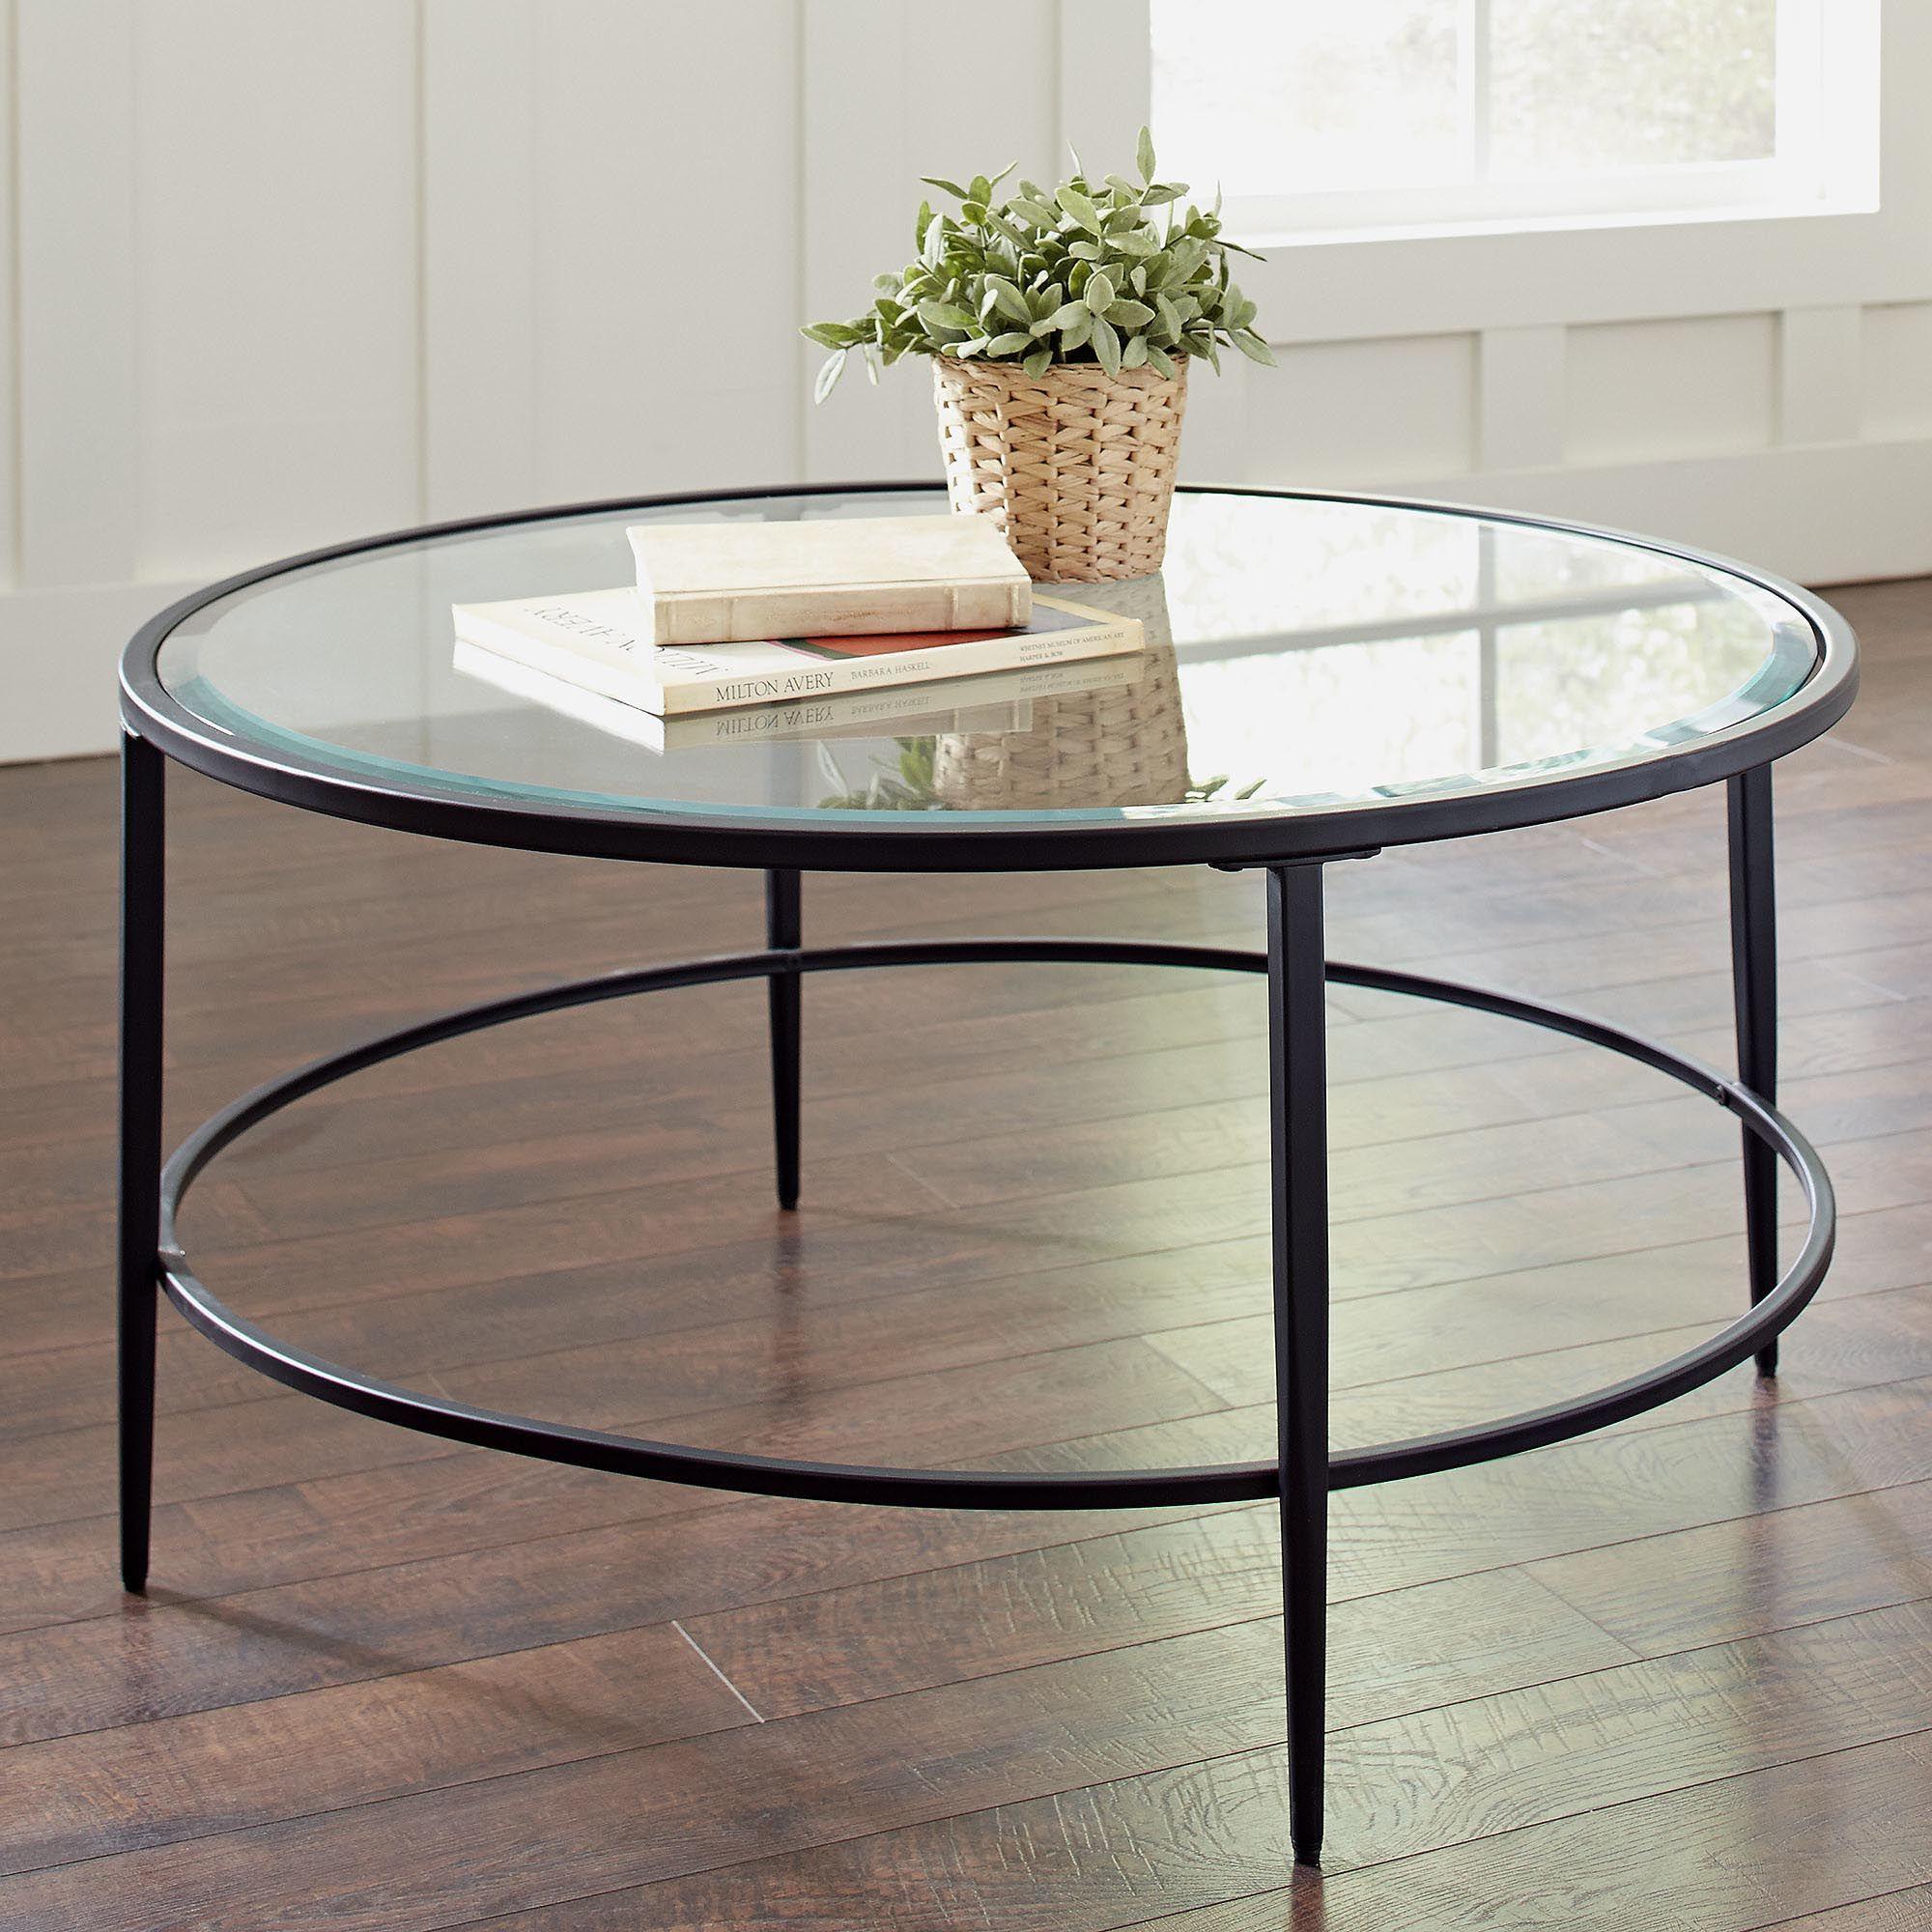 Coffee Table Glass Coffee Table Metal Legs Metal Coffee Table Legs With Glass And Metal Tables 10 Mirrored Coffee Tables Glass Coffee Table Silver Coffee Table [ 2097 x 3145 Pixel ]